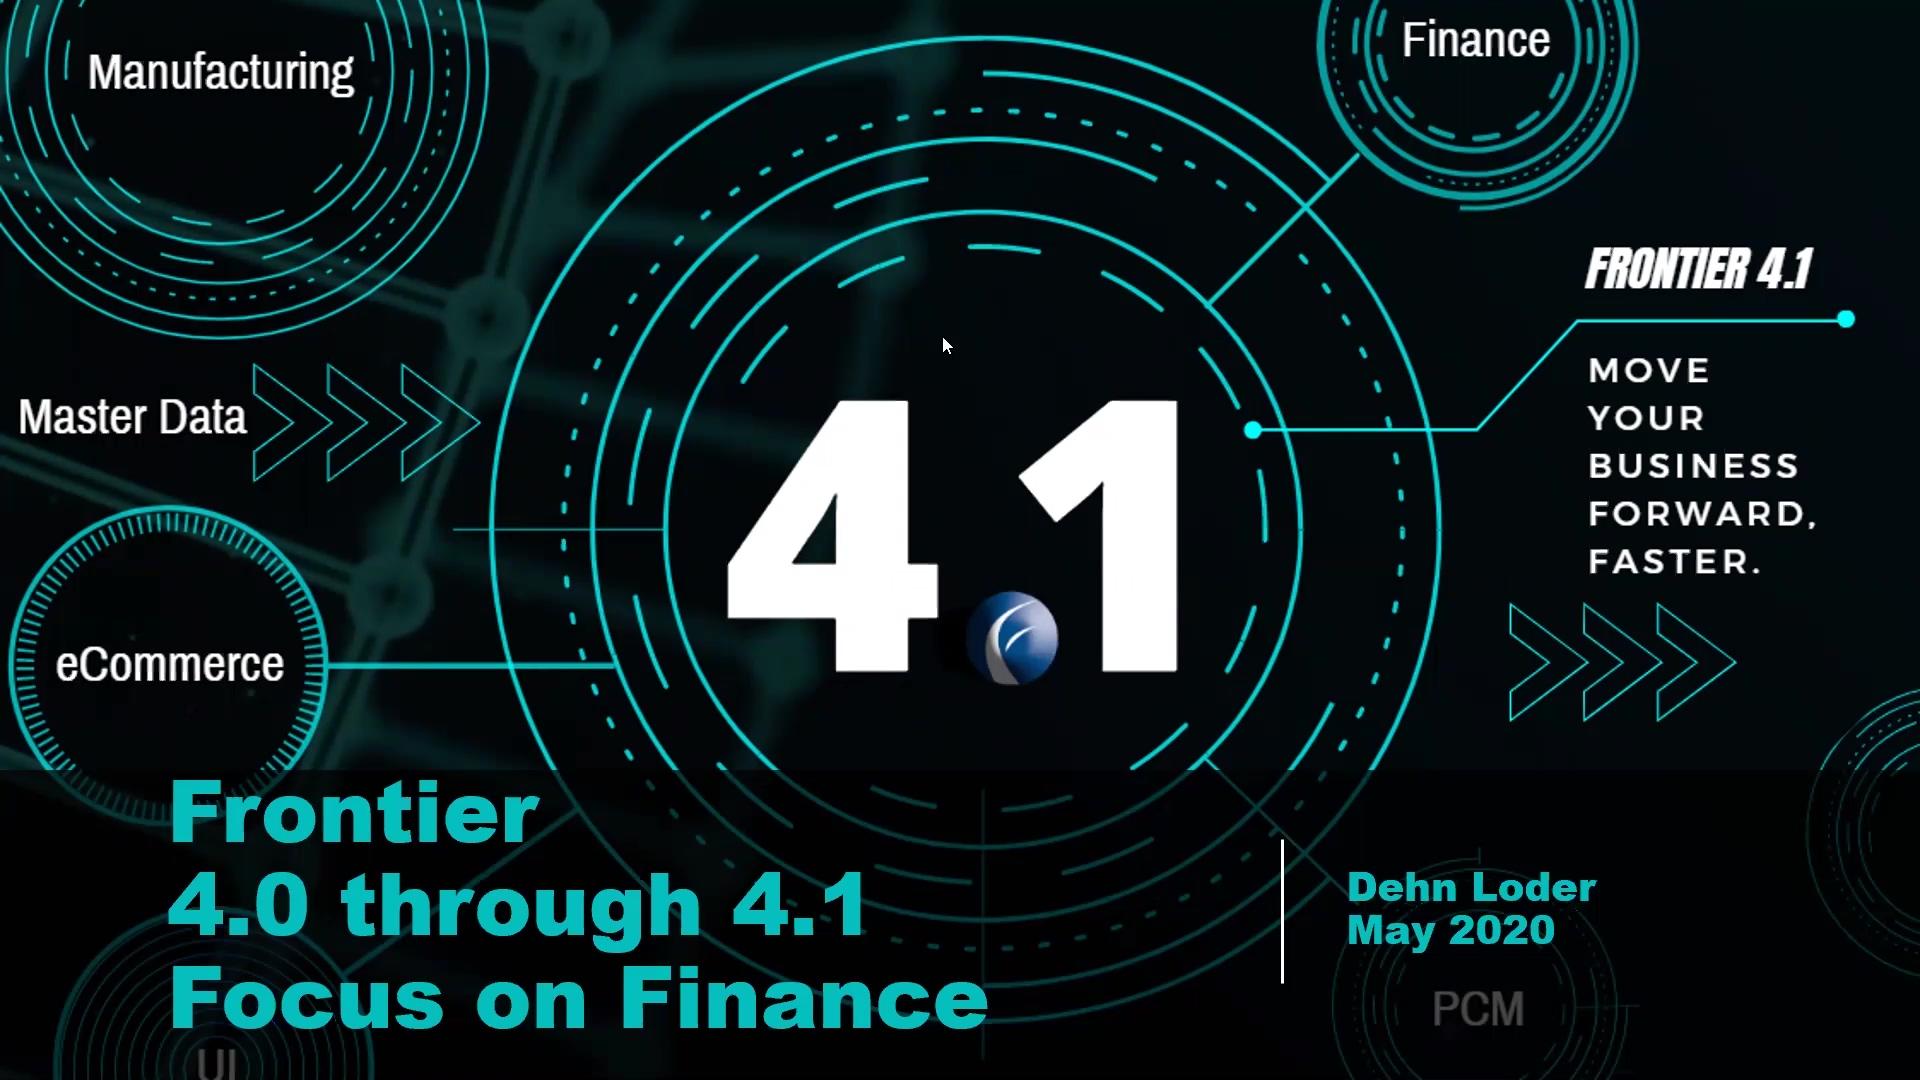 GMT20200528-175012_Frontier-4-1---Focus-on-Finance_1920x1080